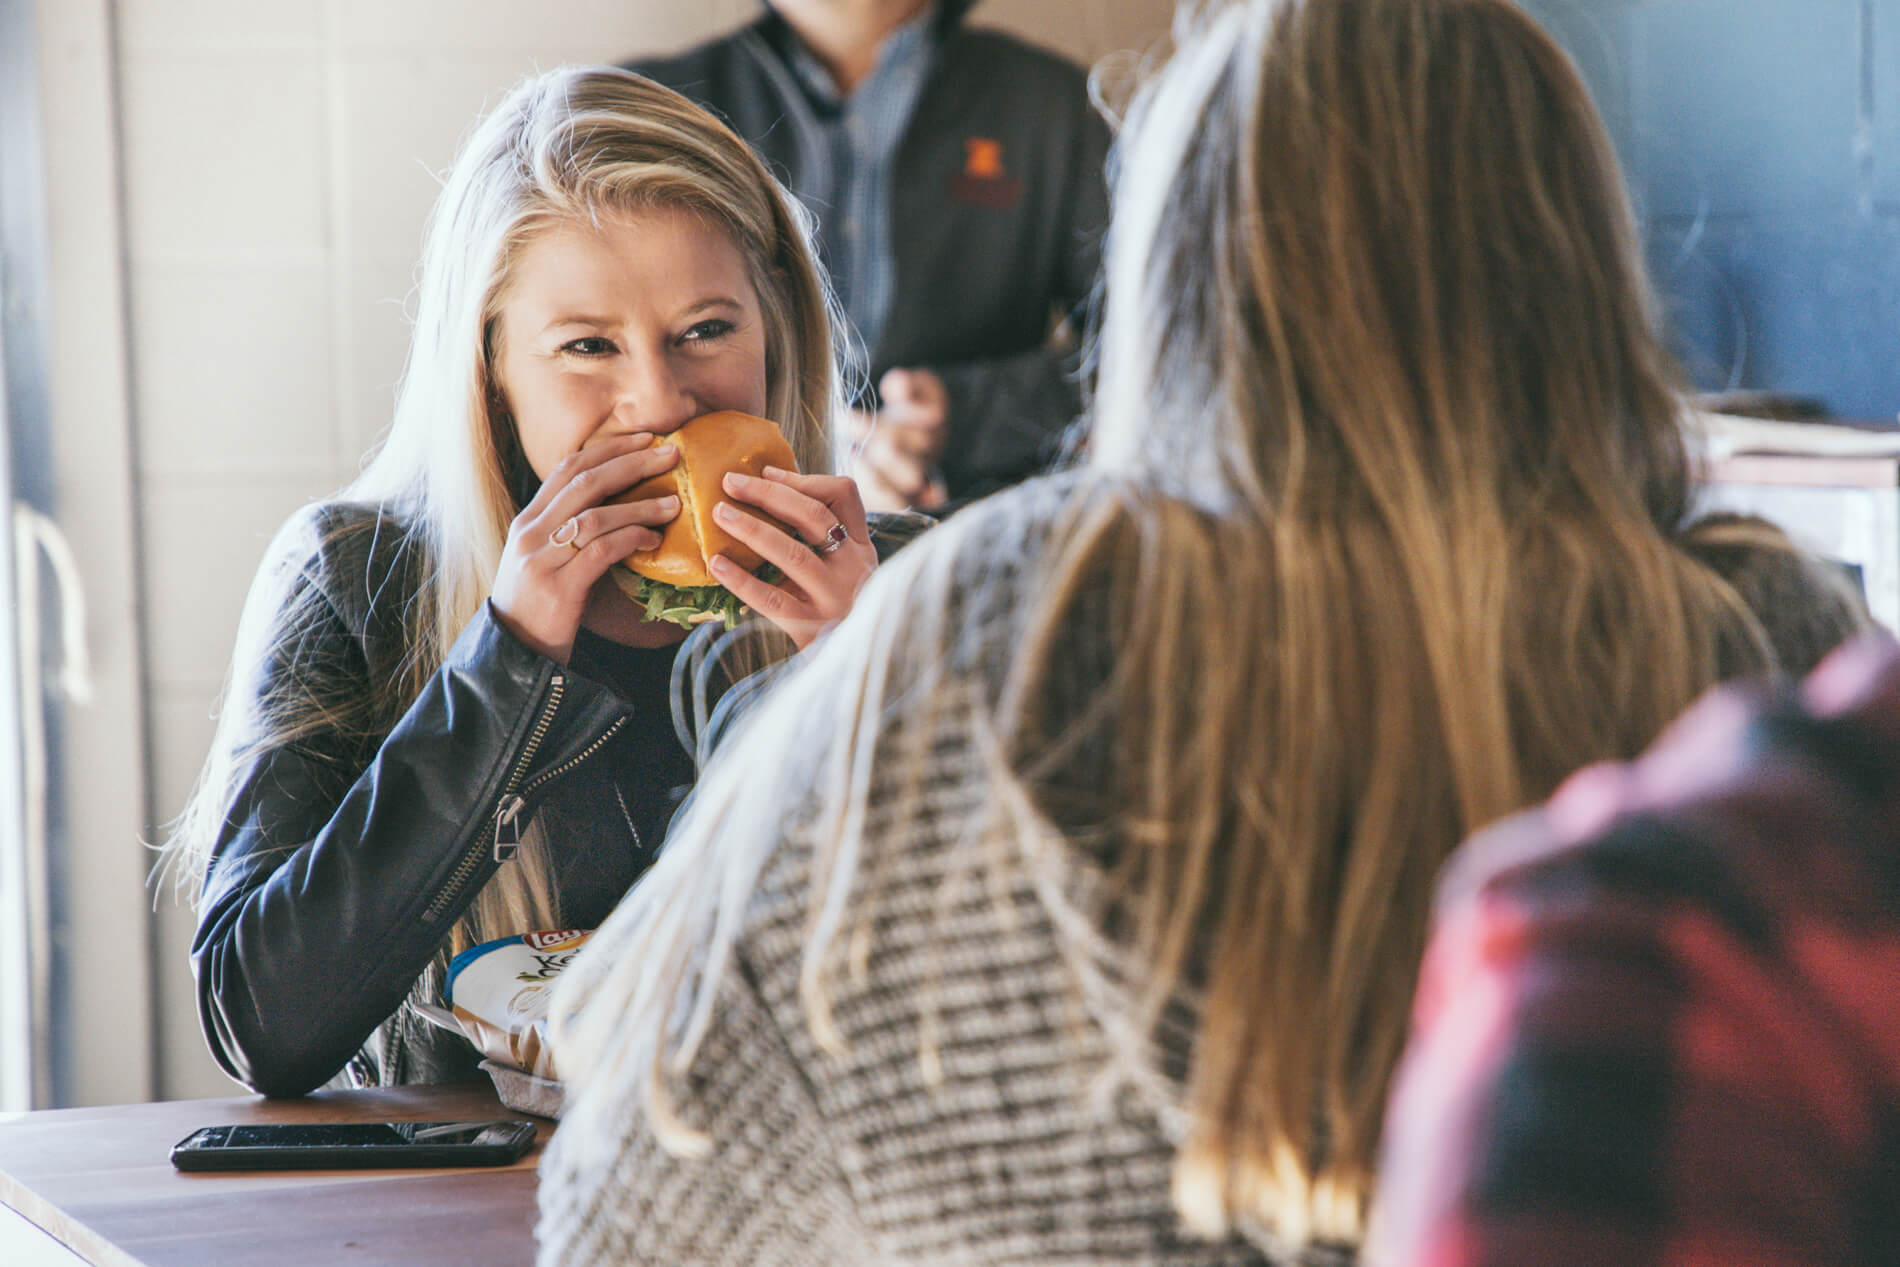 two women eating cheeseburgers